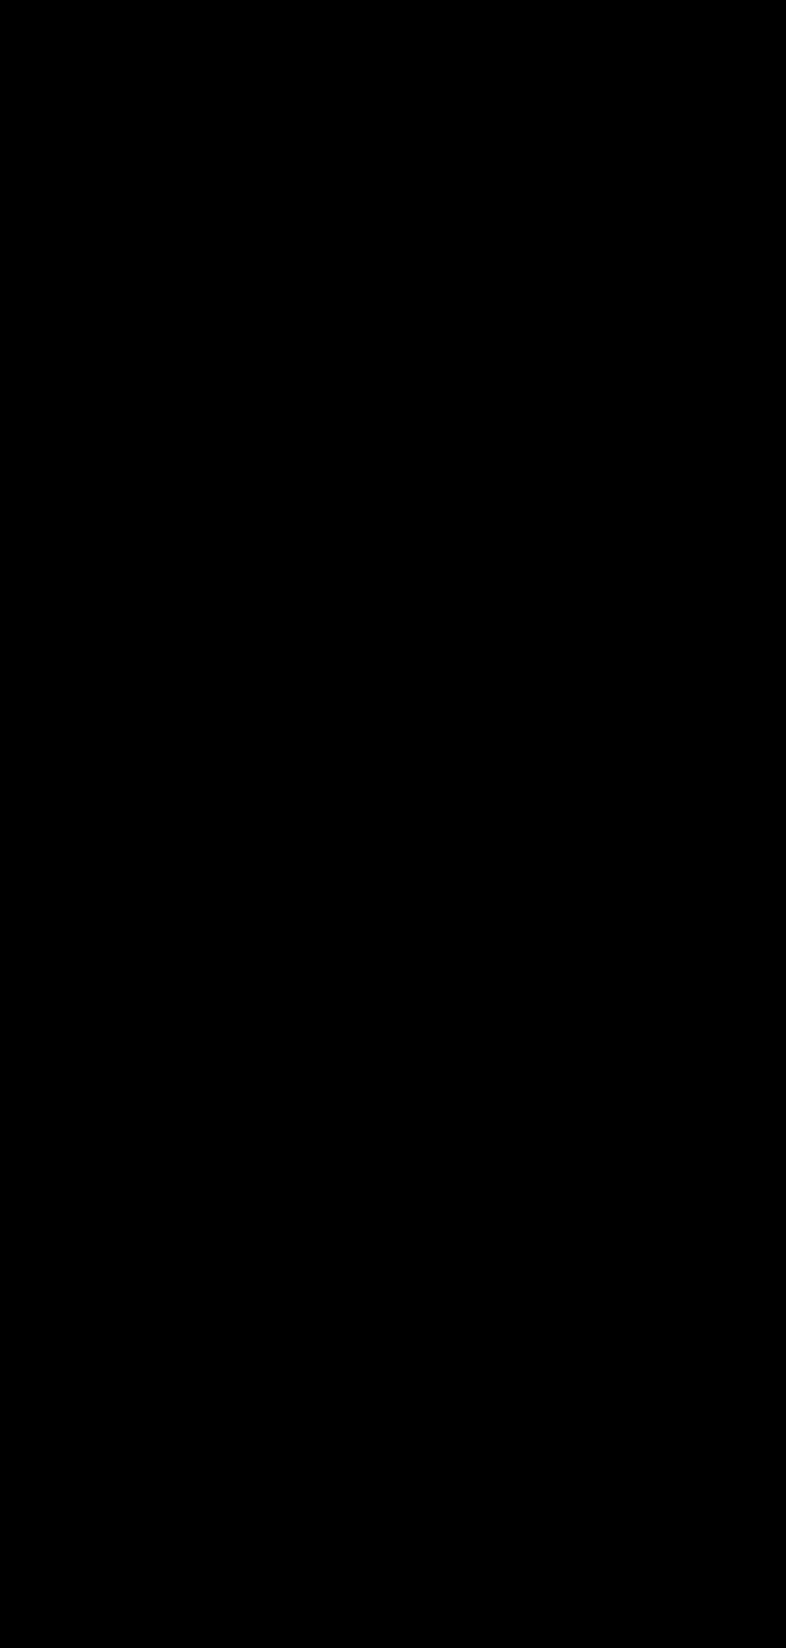 single-target-frame